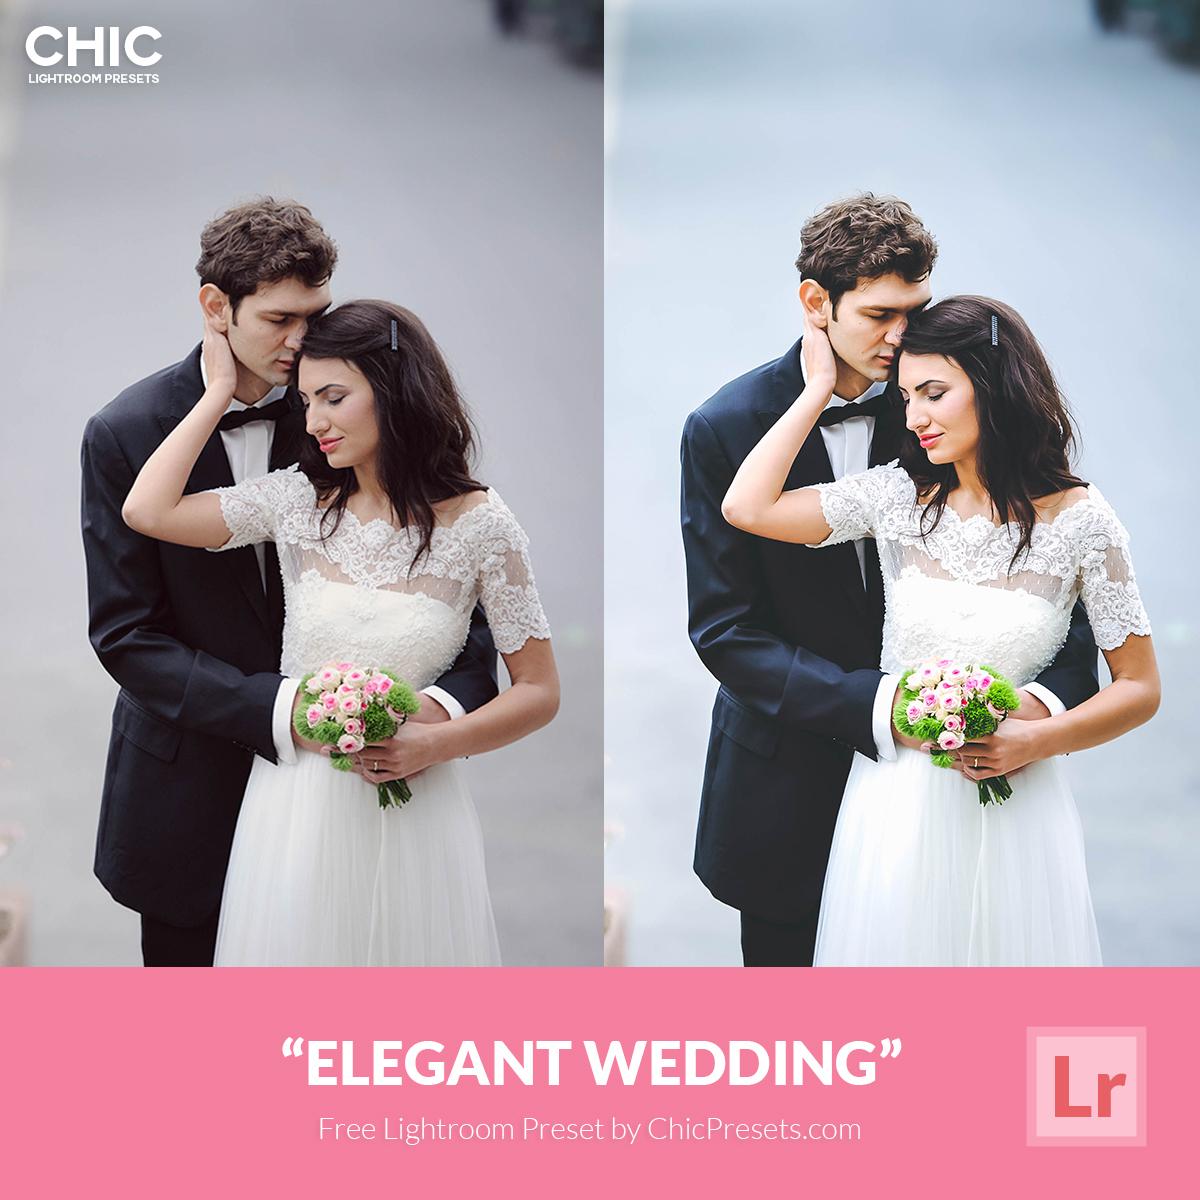 Free-Lightroom-Preset--Elegant-Wedding